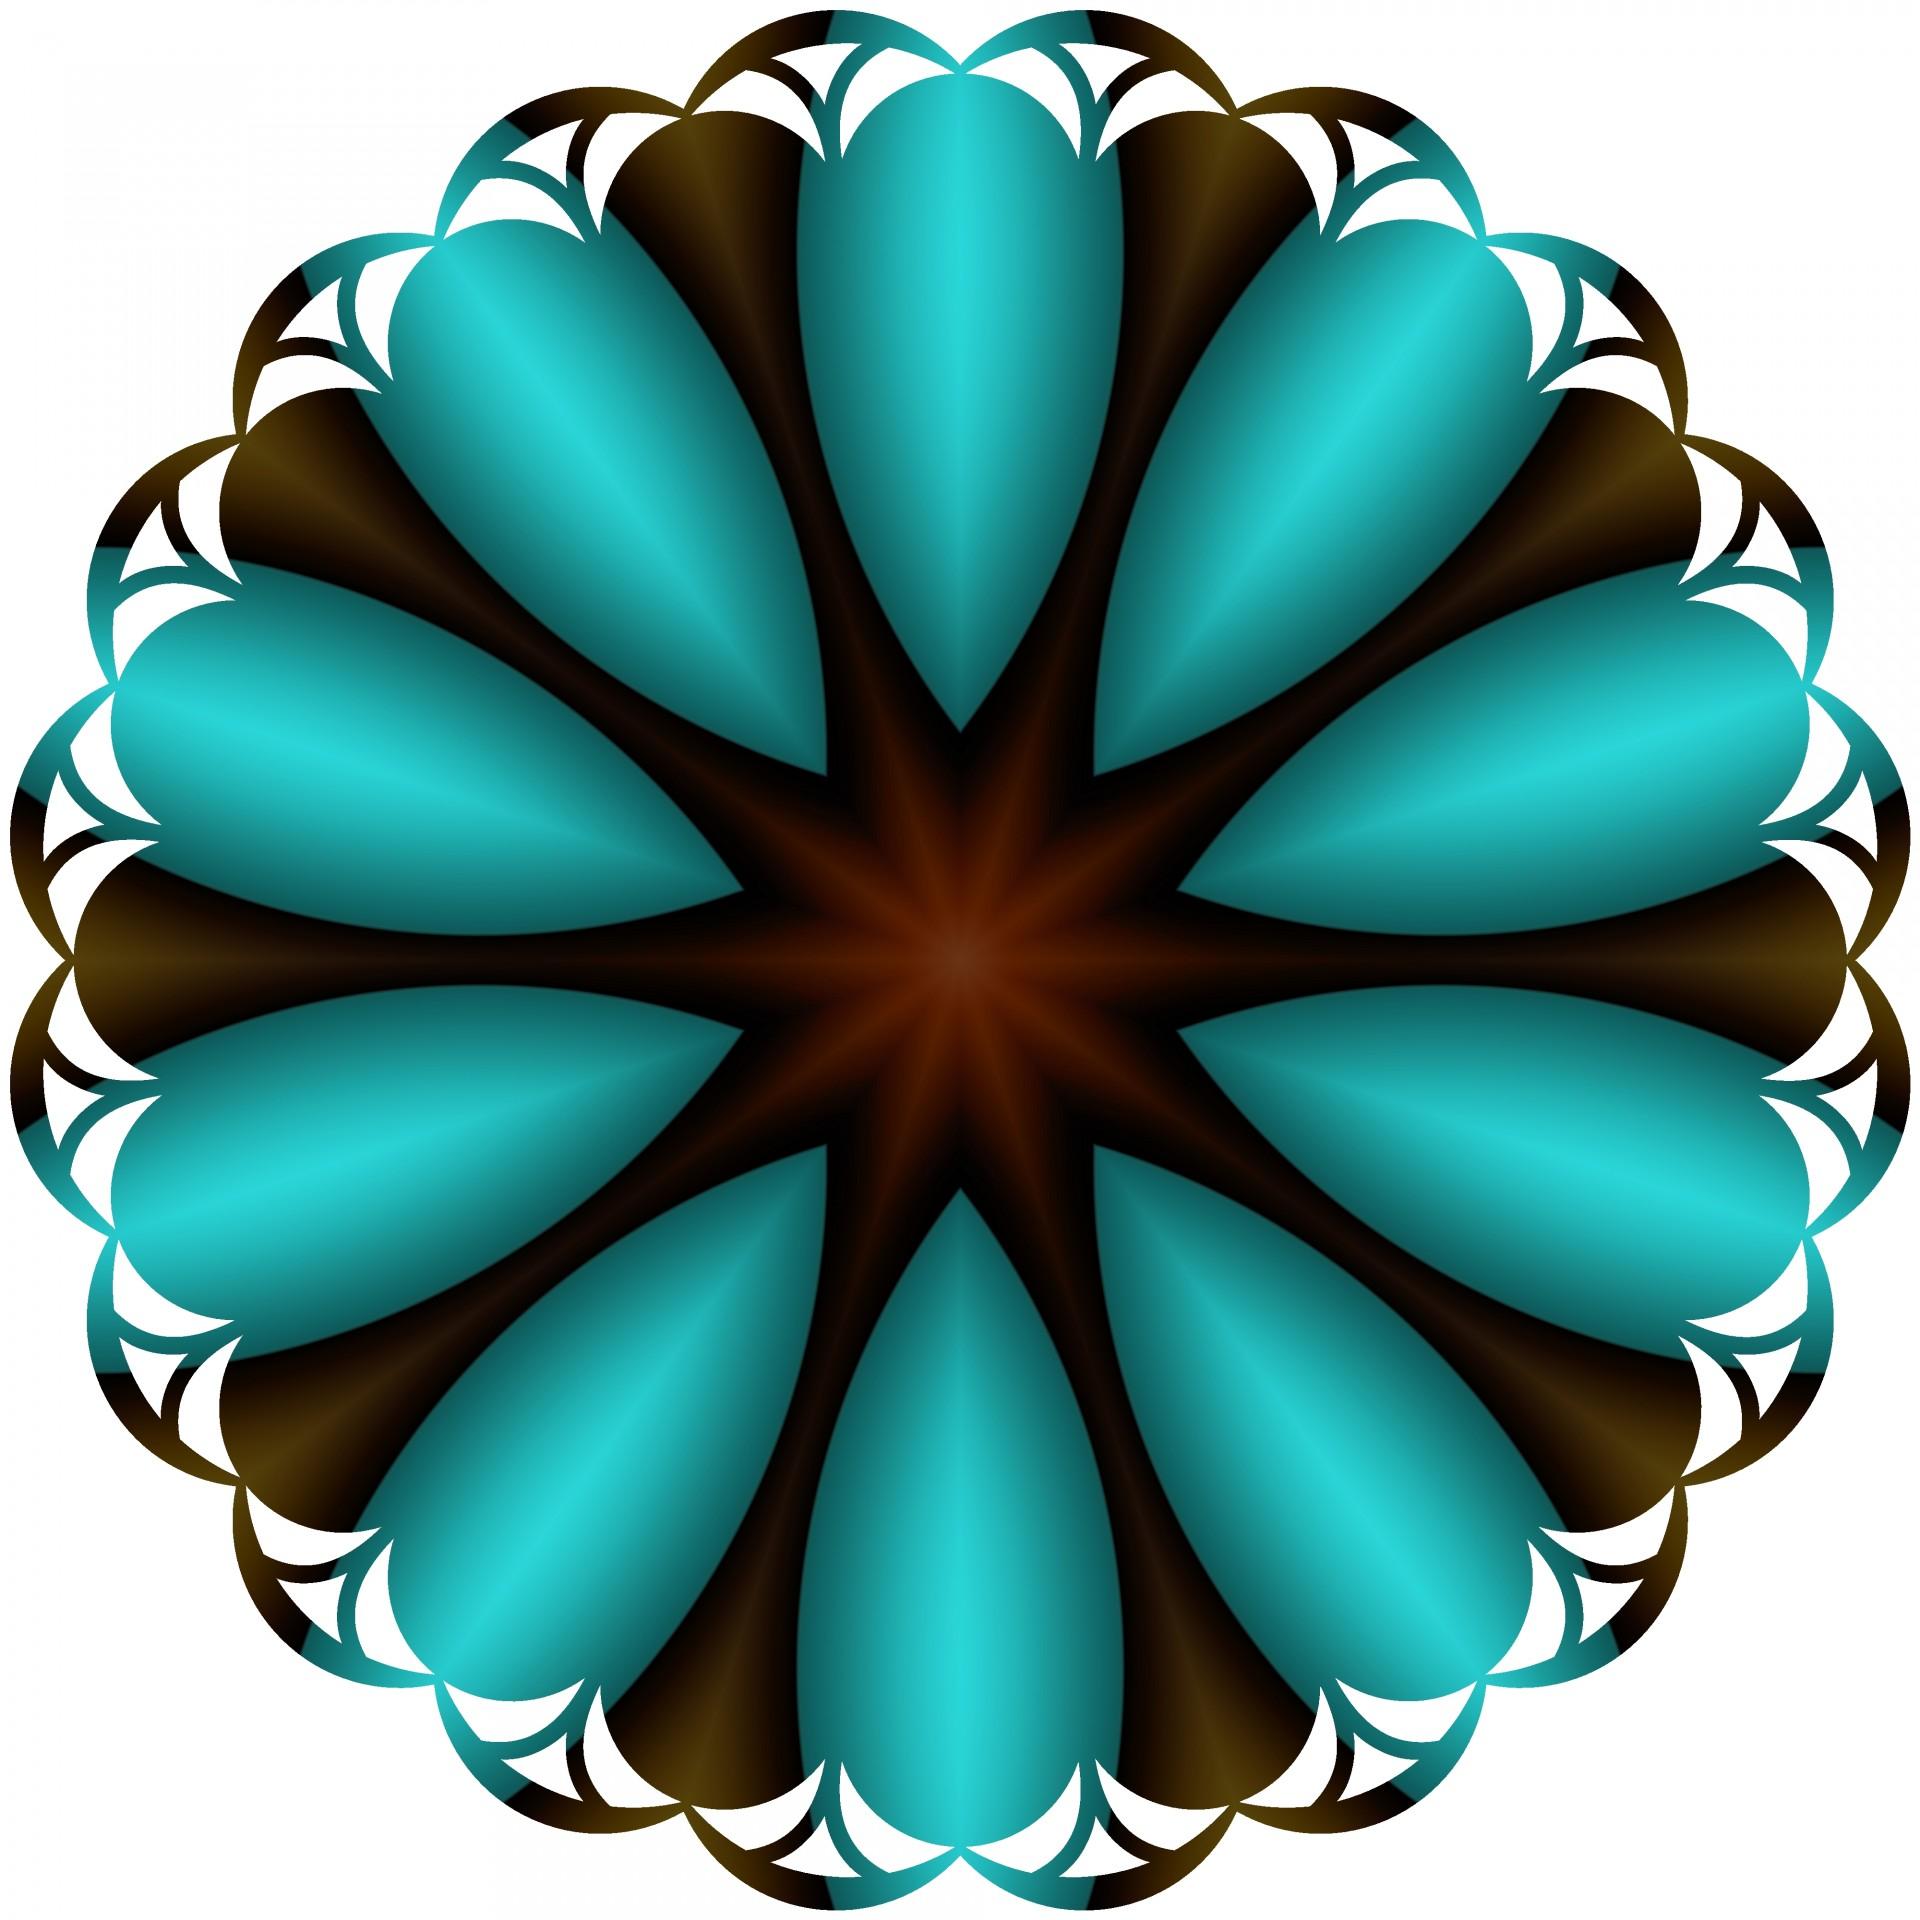 Blue Petals Free Stock Photo.